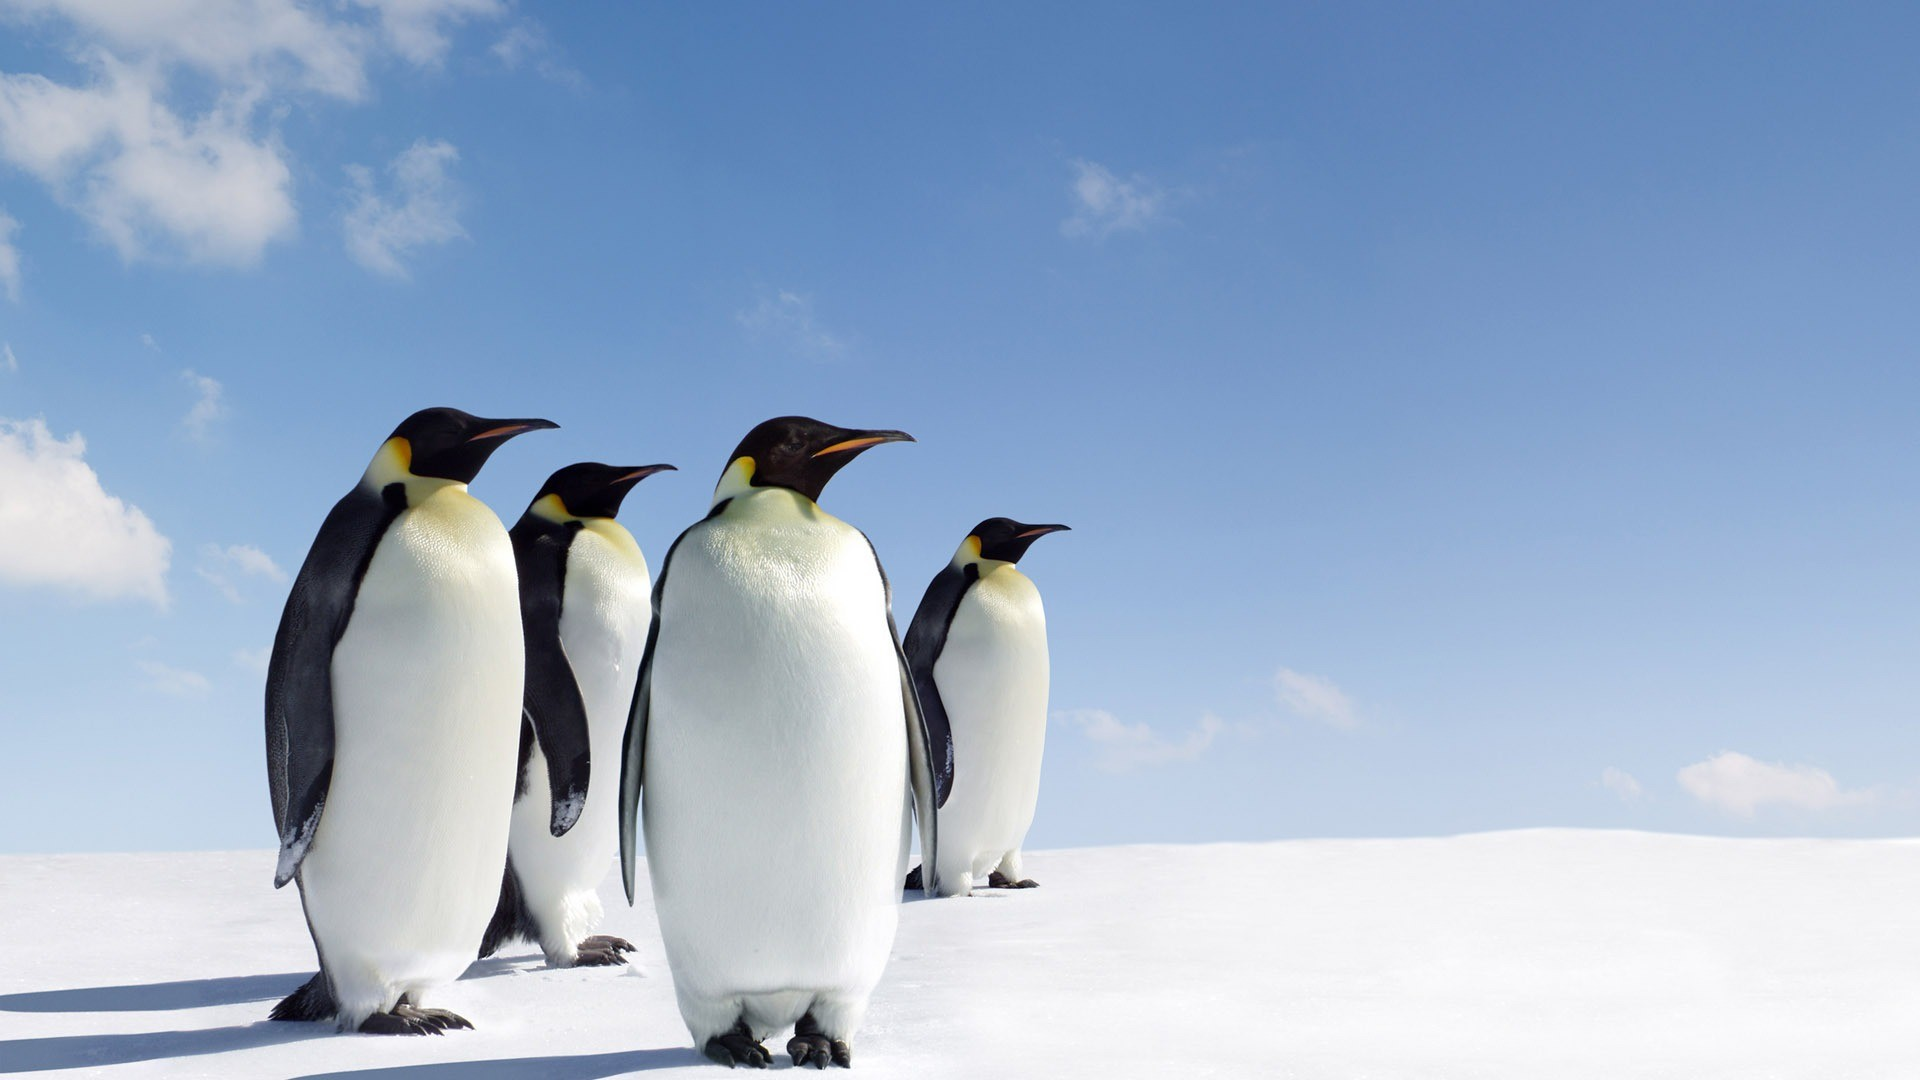 Cute designs of 3D Penguin Wallpaper   oviyahdwallpaper   Pinterest    Wallpaper and Wallpaper backgrounds